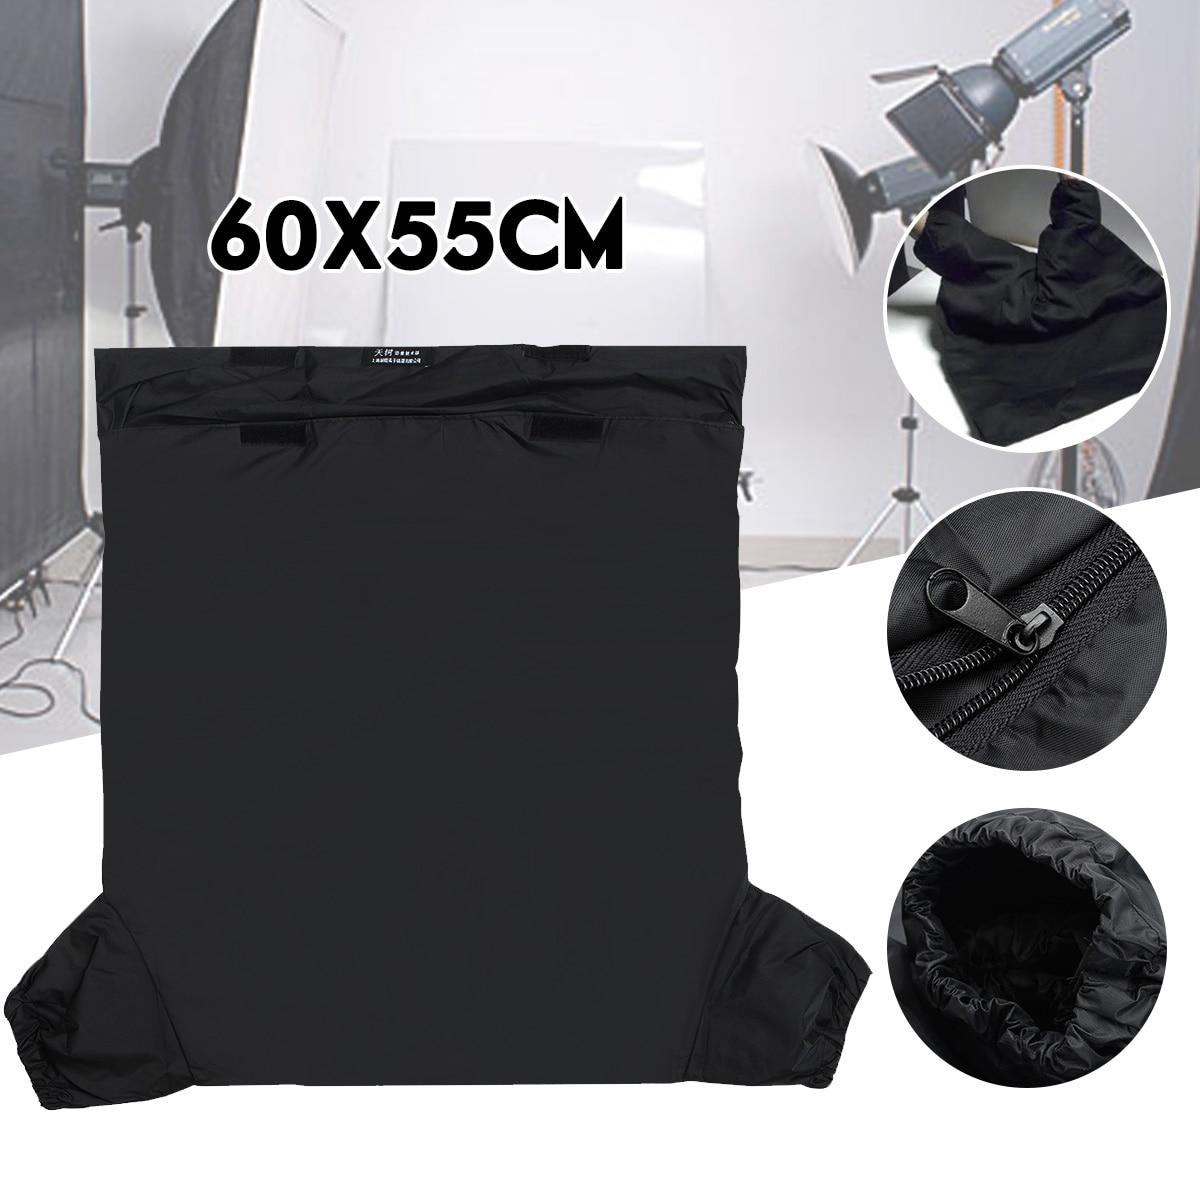 60cm x 55cm New Portable Darkroom Camera Film Changing Bag  Load Photography Zipper Camera Bag60cm x 55cm New Portable Darkroom Camera Film Changing Bag  Load Photography Zipper Camera Bag